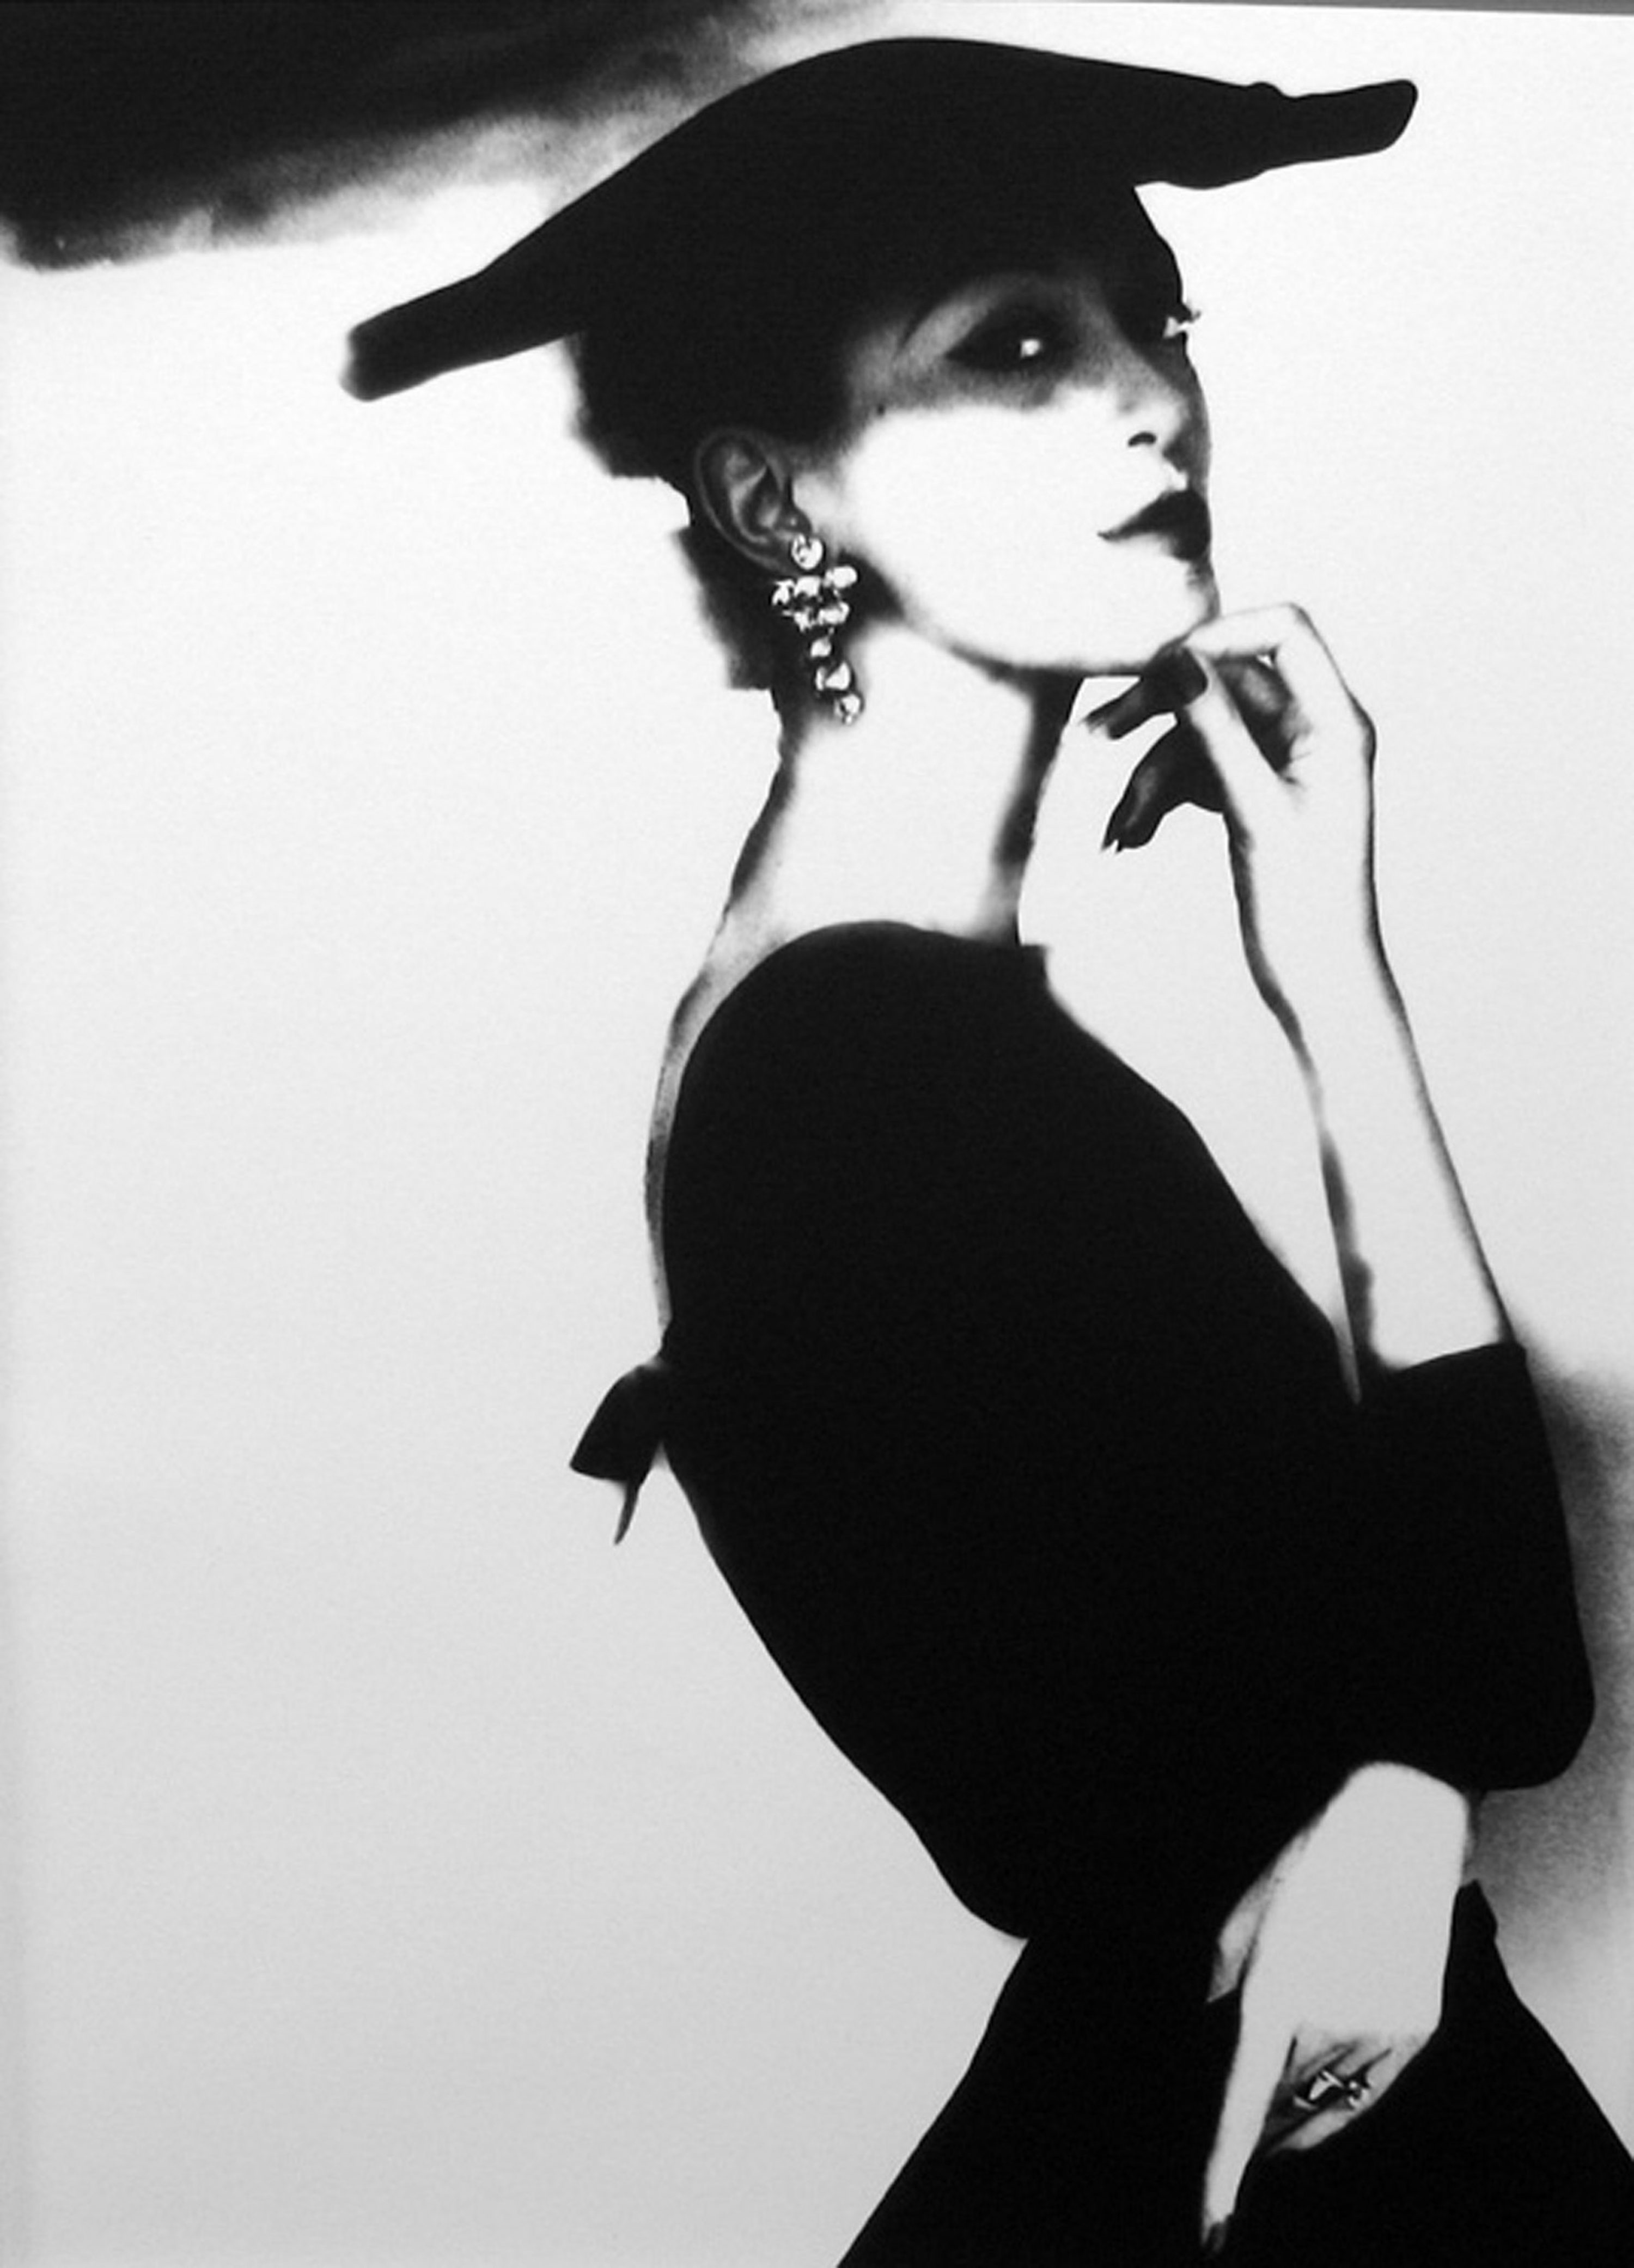 Fotó: Lillian Bassman: Barbara Mullen, Harper's Bazaar, New York, c. 1958